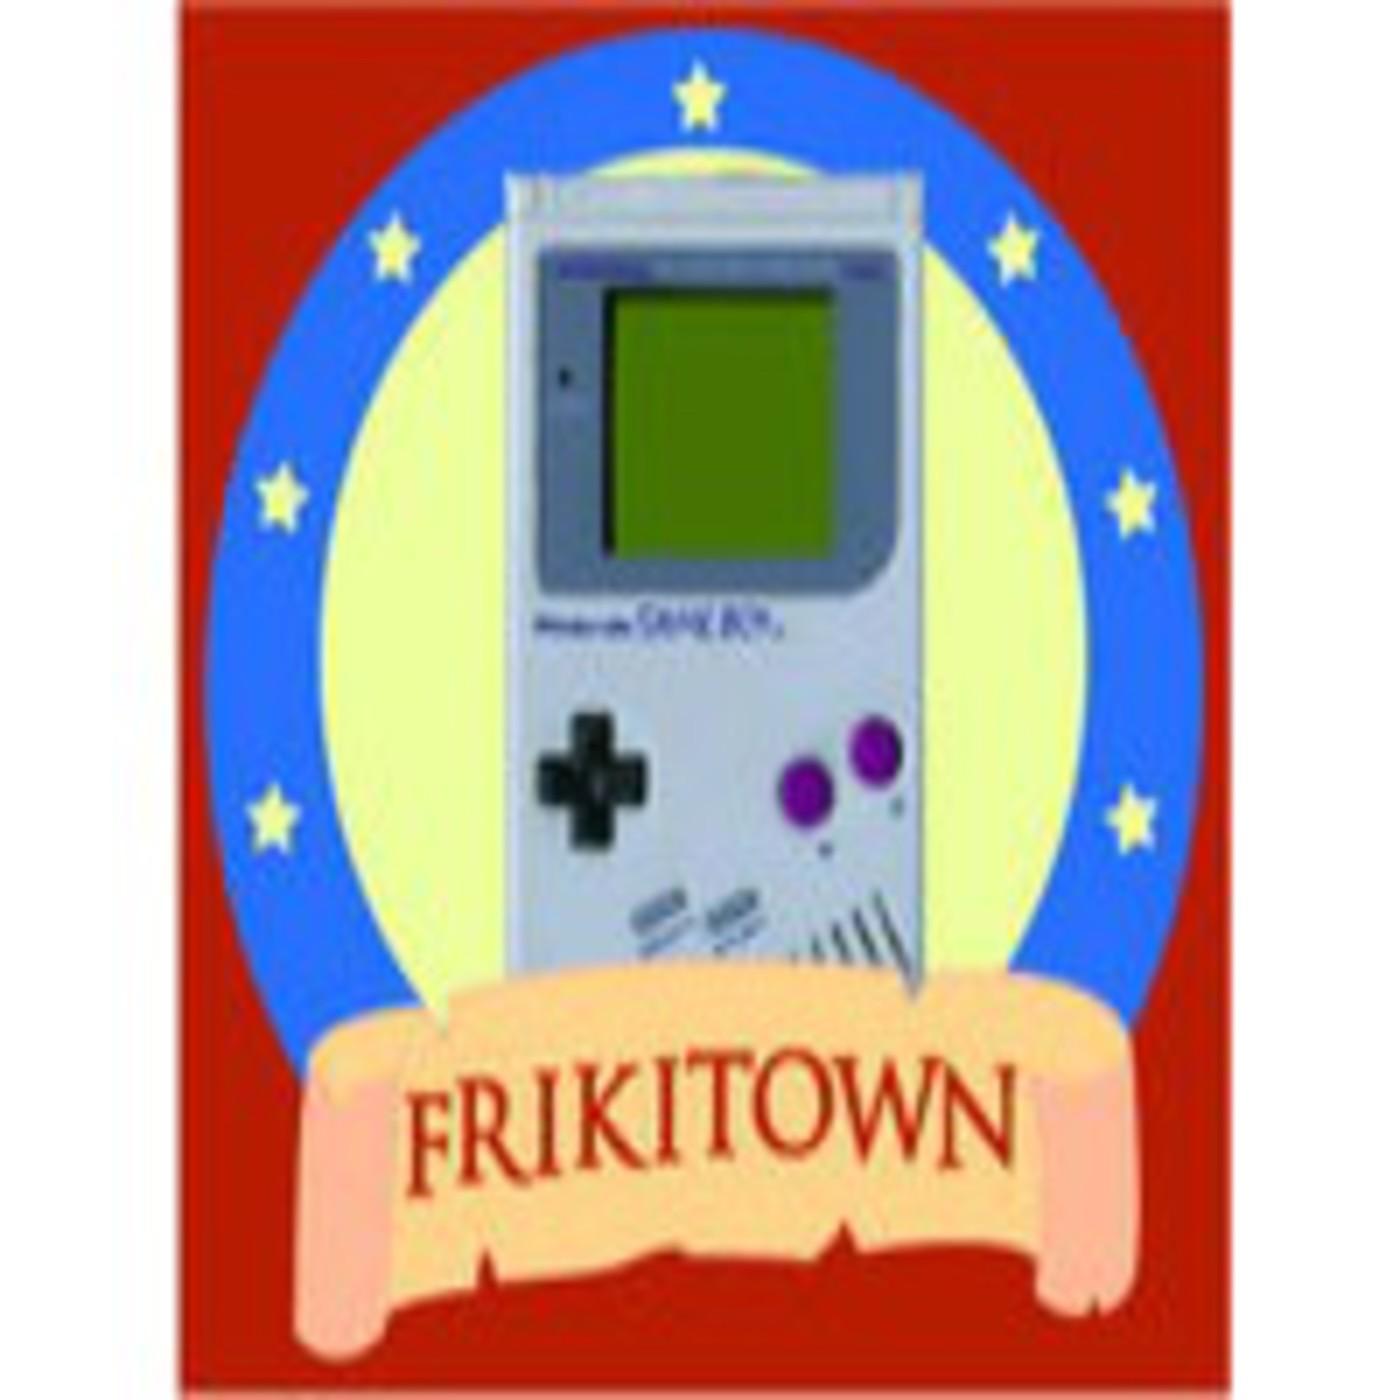 Afrikitown 1x16 Psviteando (Especial Portatiles: +30 años de portatiles e impresiones Psvita y 3ds)